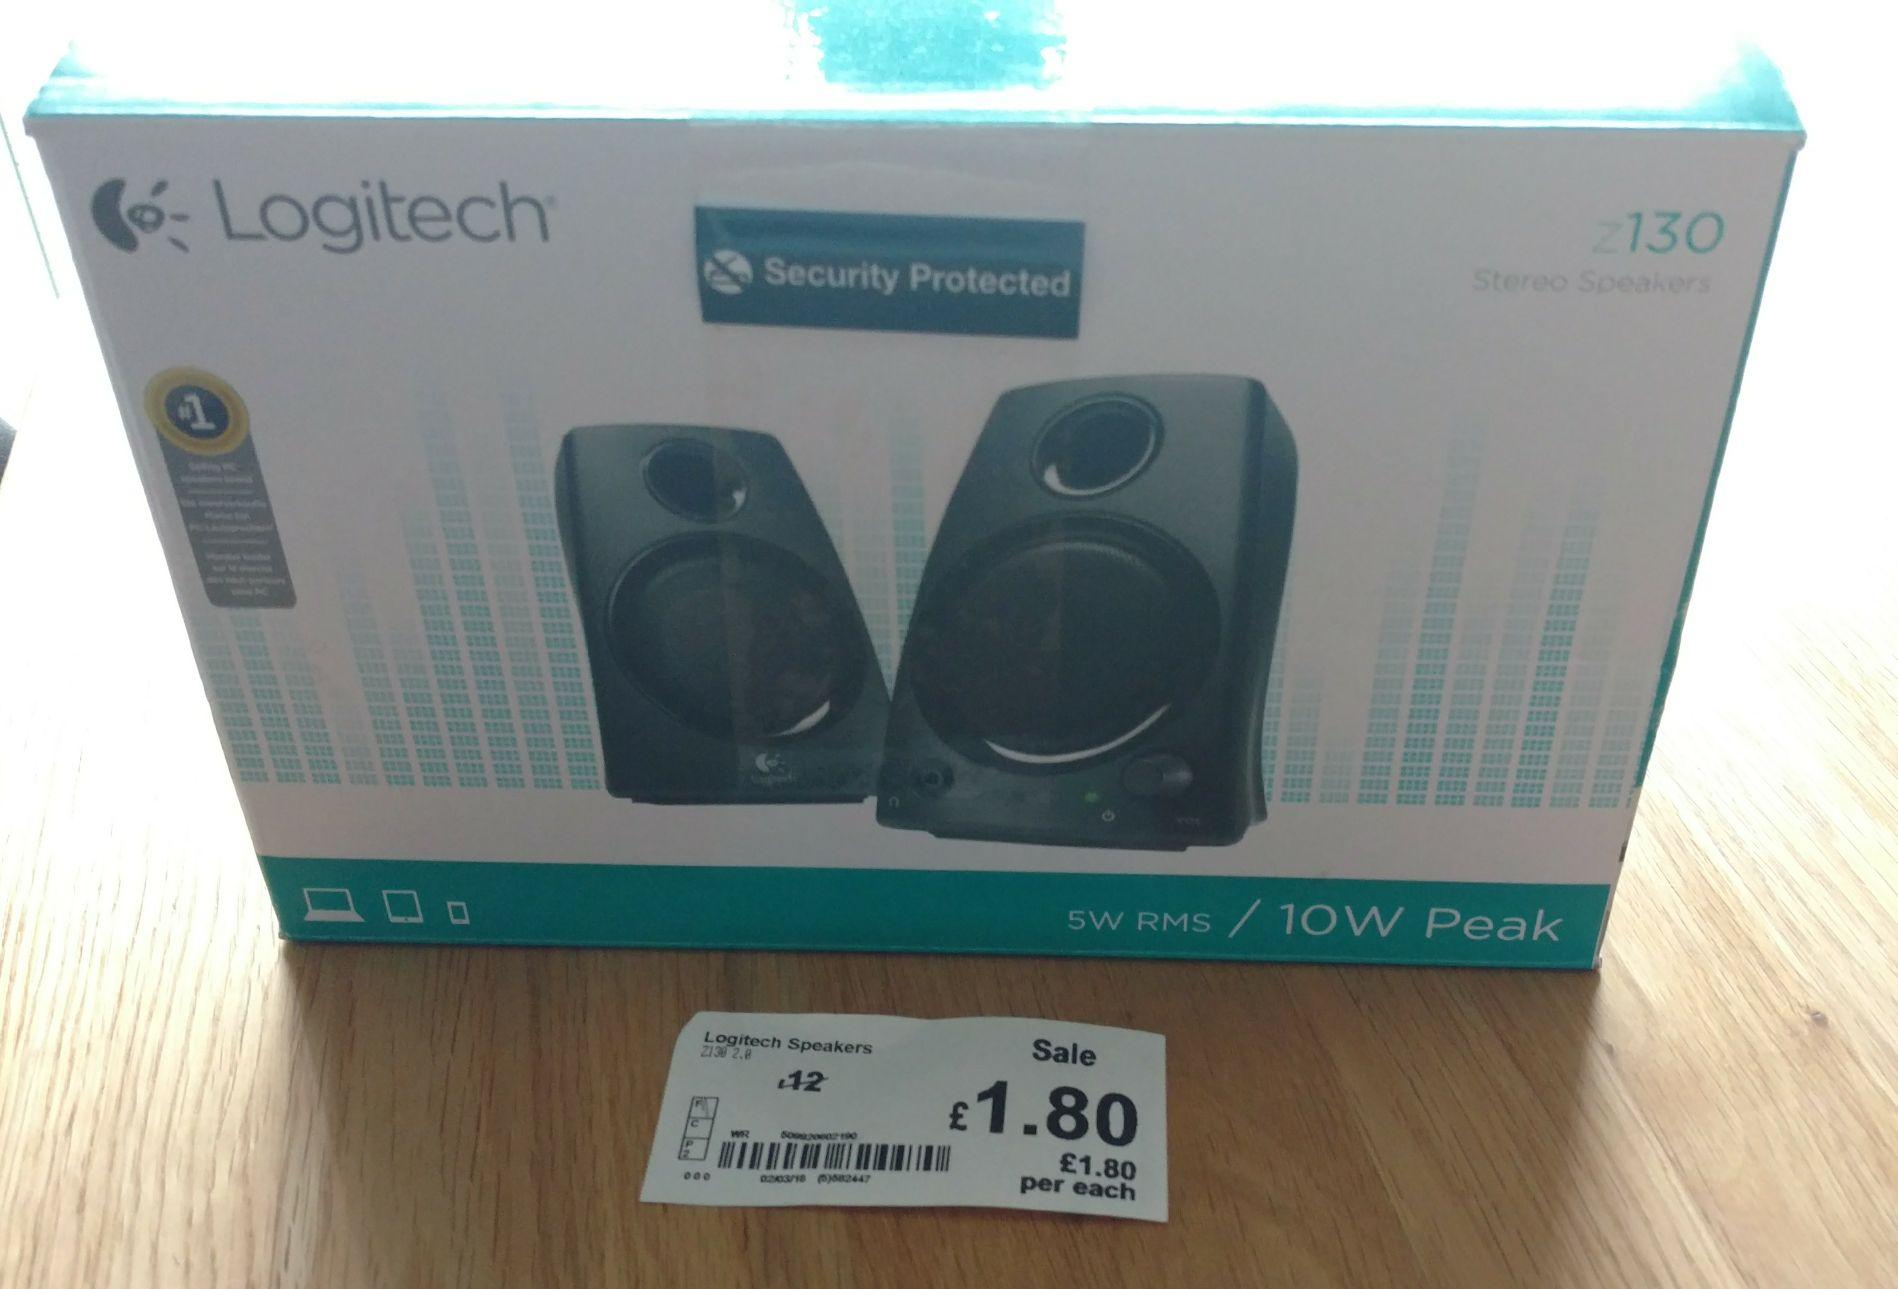 Logitech Z130 PC speakers £1.80 in store @ Asda